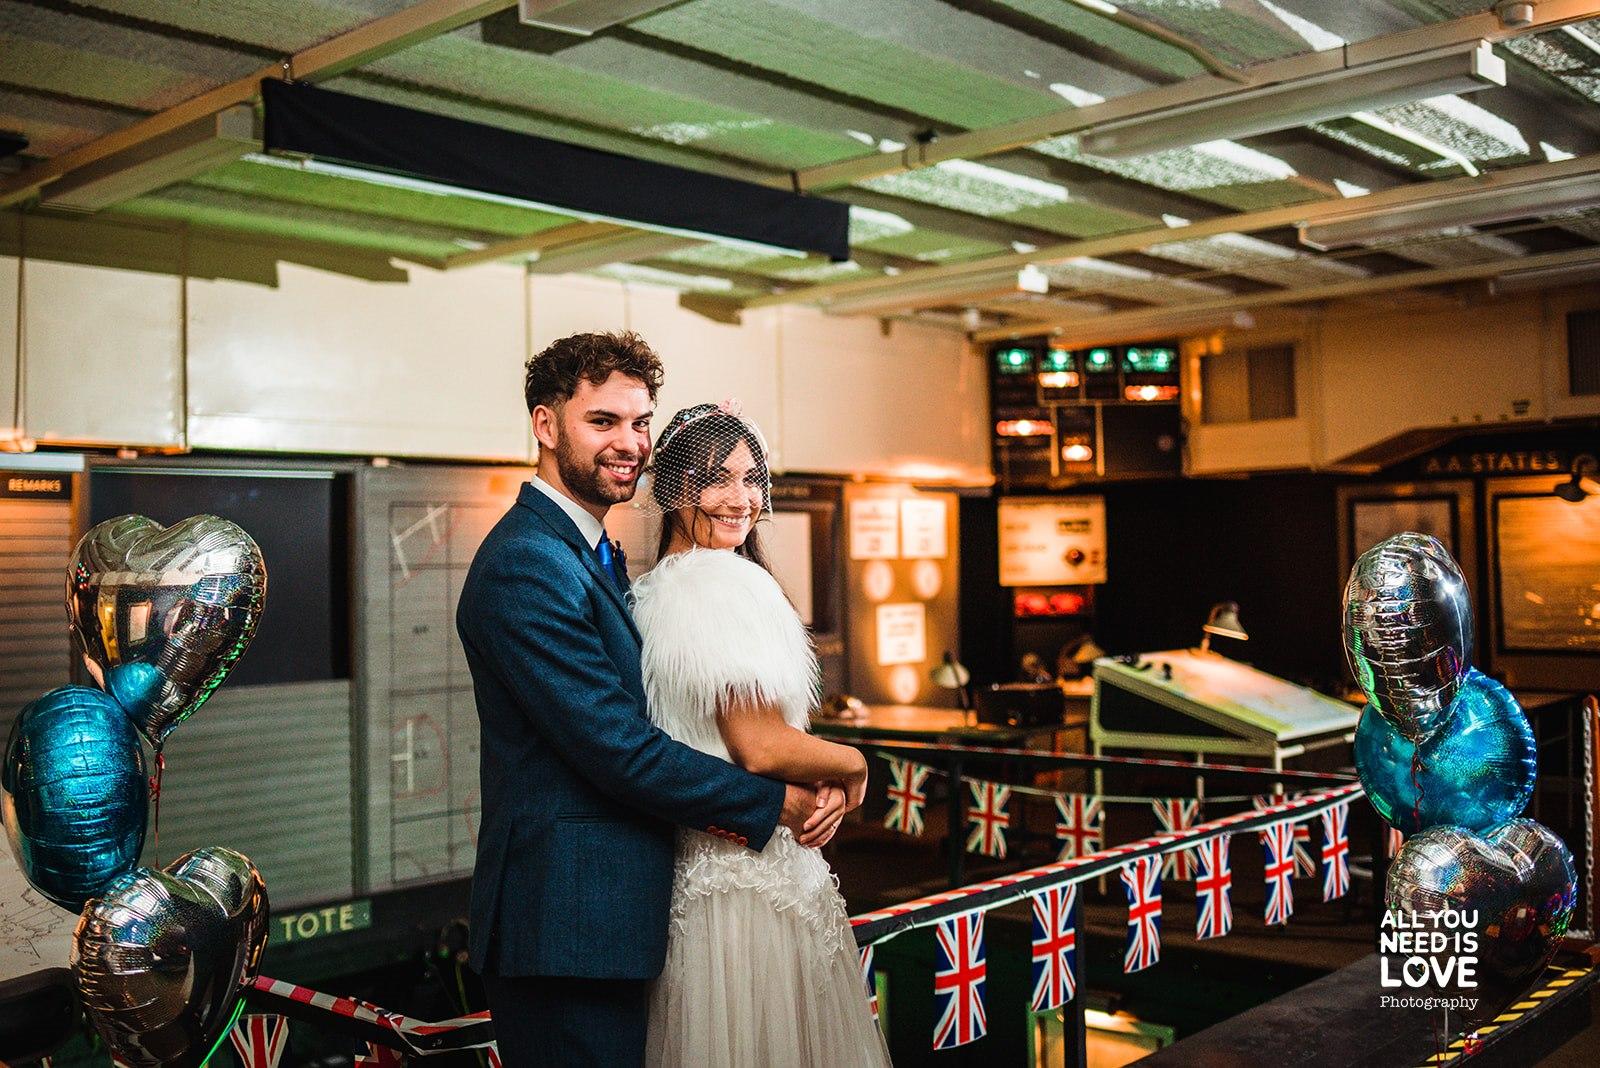 RAF Holmpton- All You Need Is Love Photography- Army Wedding Venue- Historic Wedding Venue- Underground wedding venue- unique wedding venue- the best alternative wedding venues- unconventional wedding- war bunker wedding